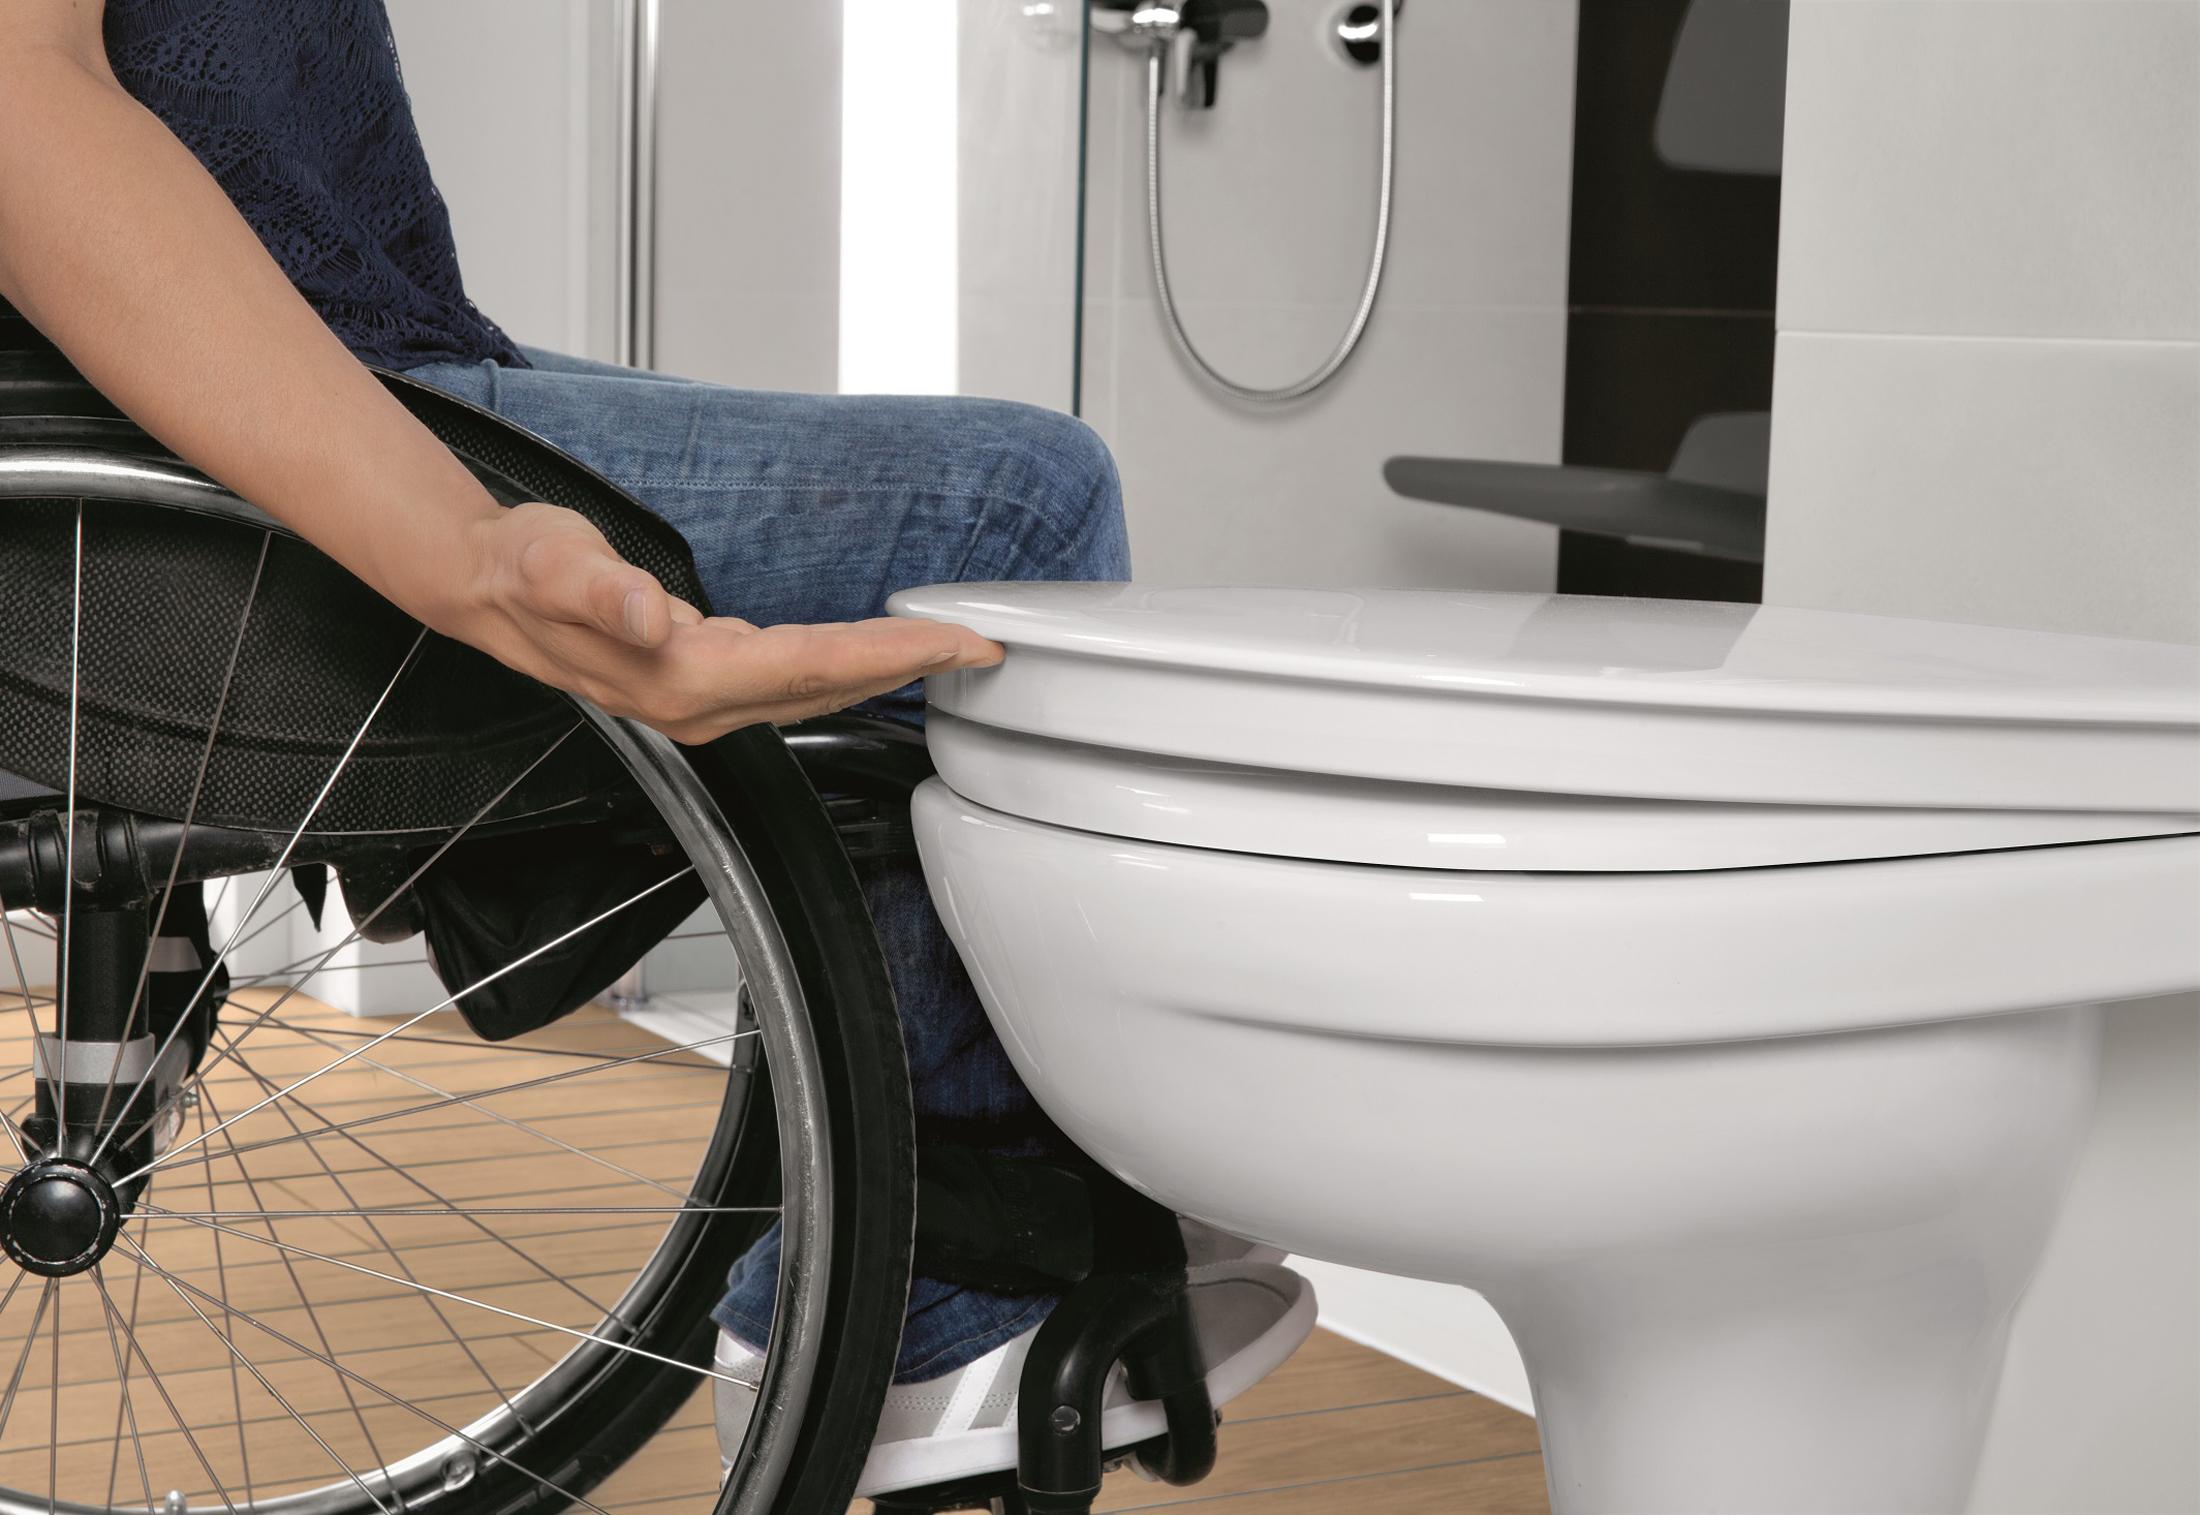 washdown wc vita by villeroy boch bath wellness stylepark. Black Bedroom Furniture Sets. Home Design Ideas